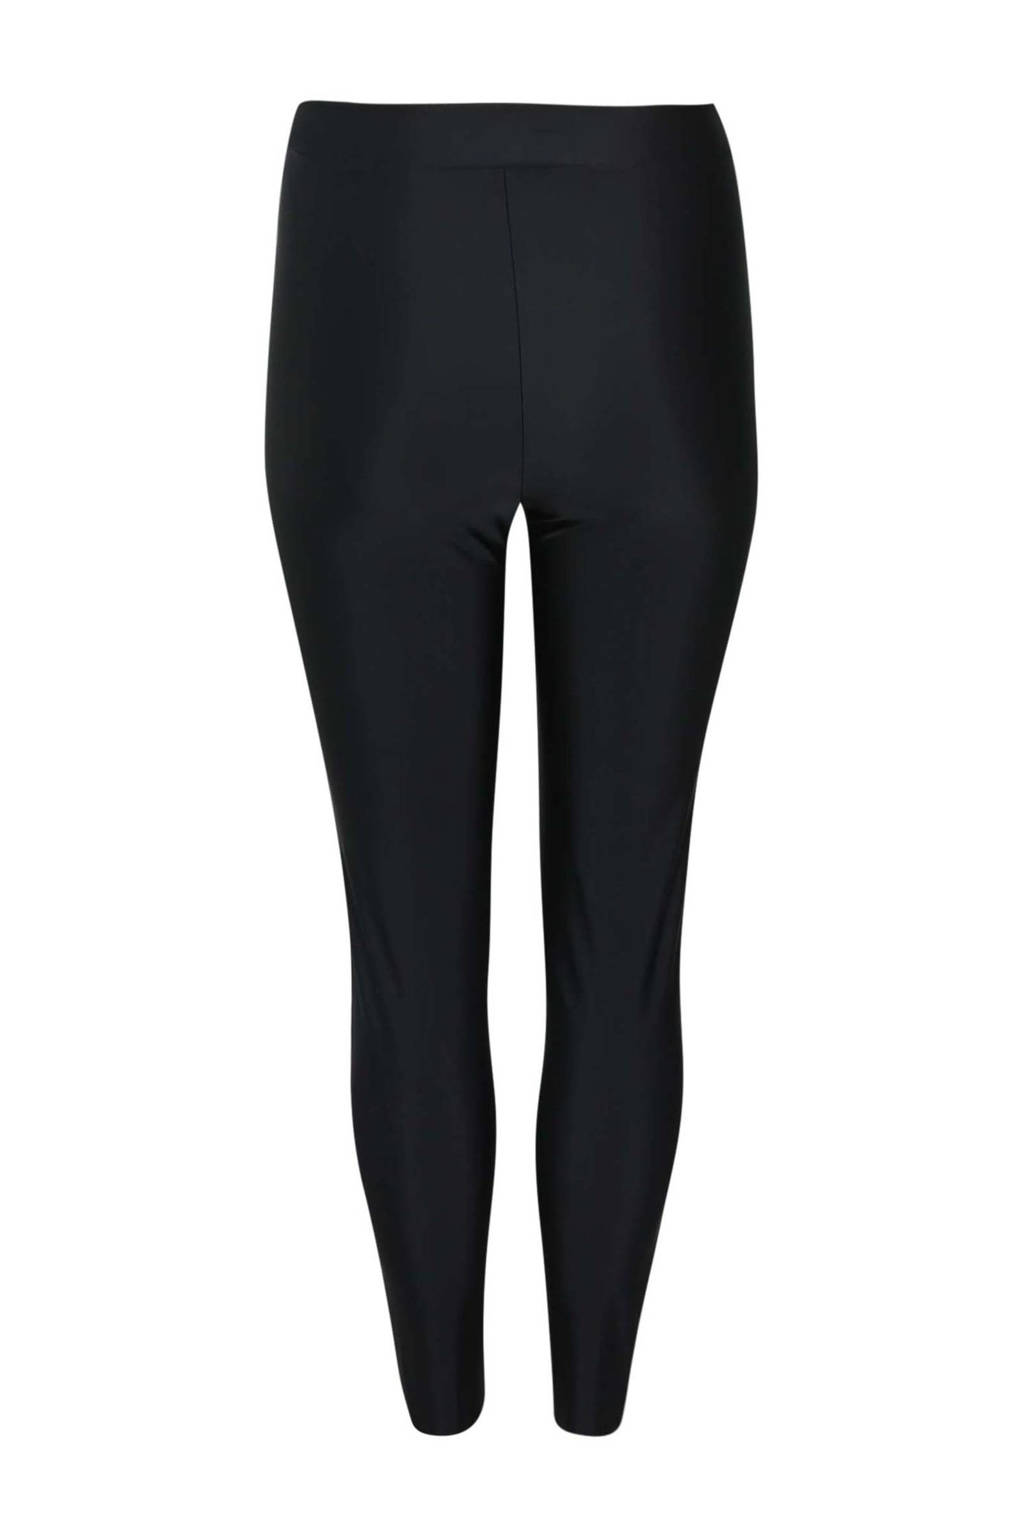 Paprika LUZ x Paprika Plus Size sportlegging Lucile zwart/kaki, Zwart/kaki